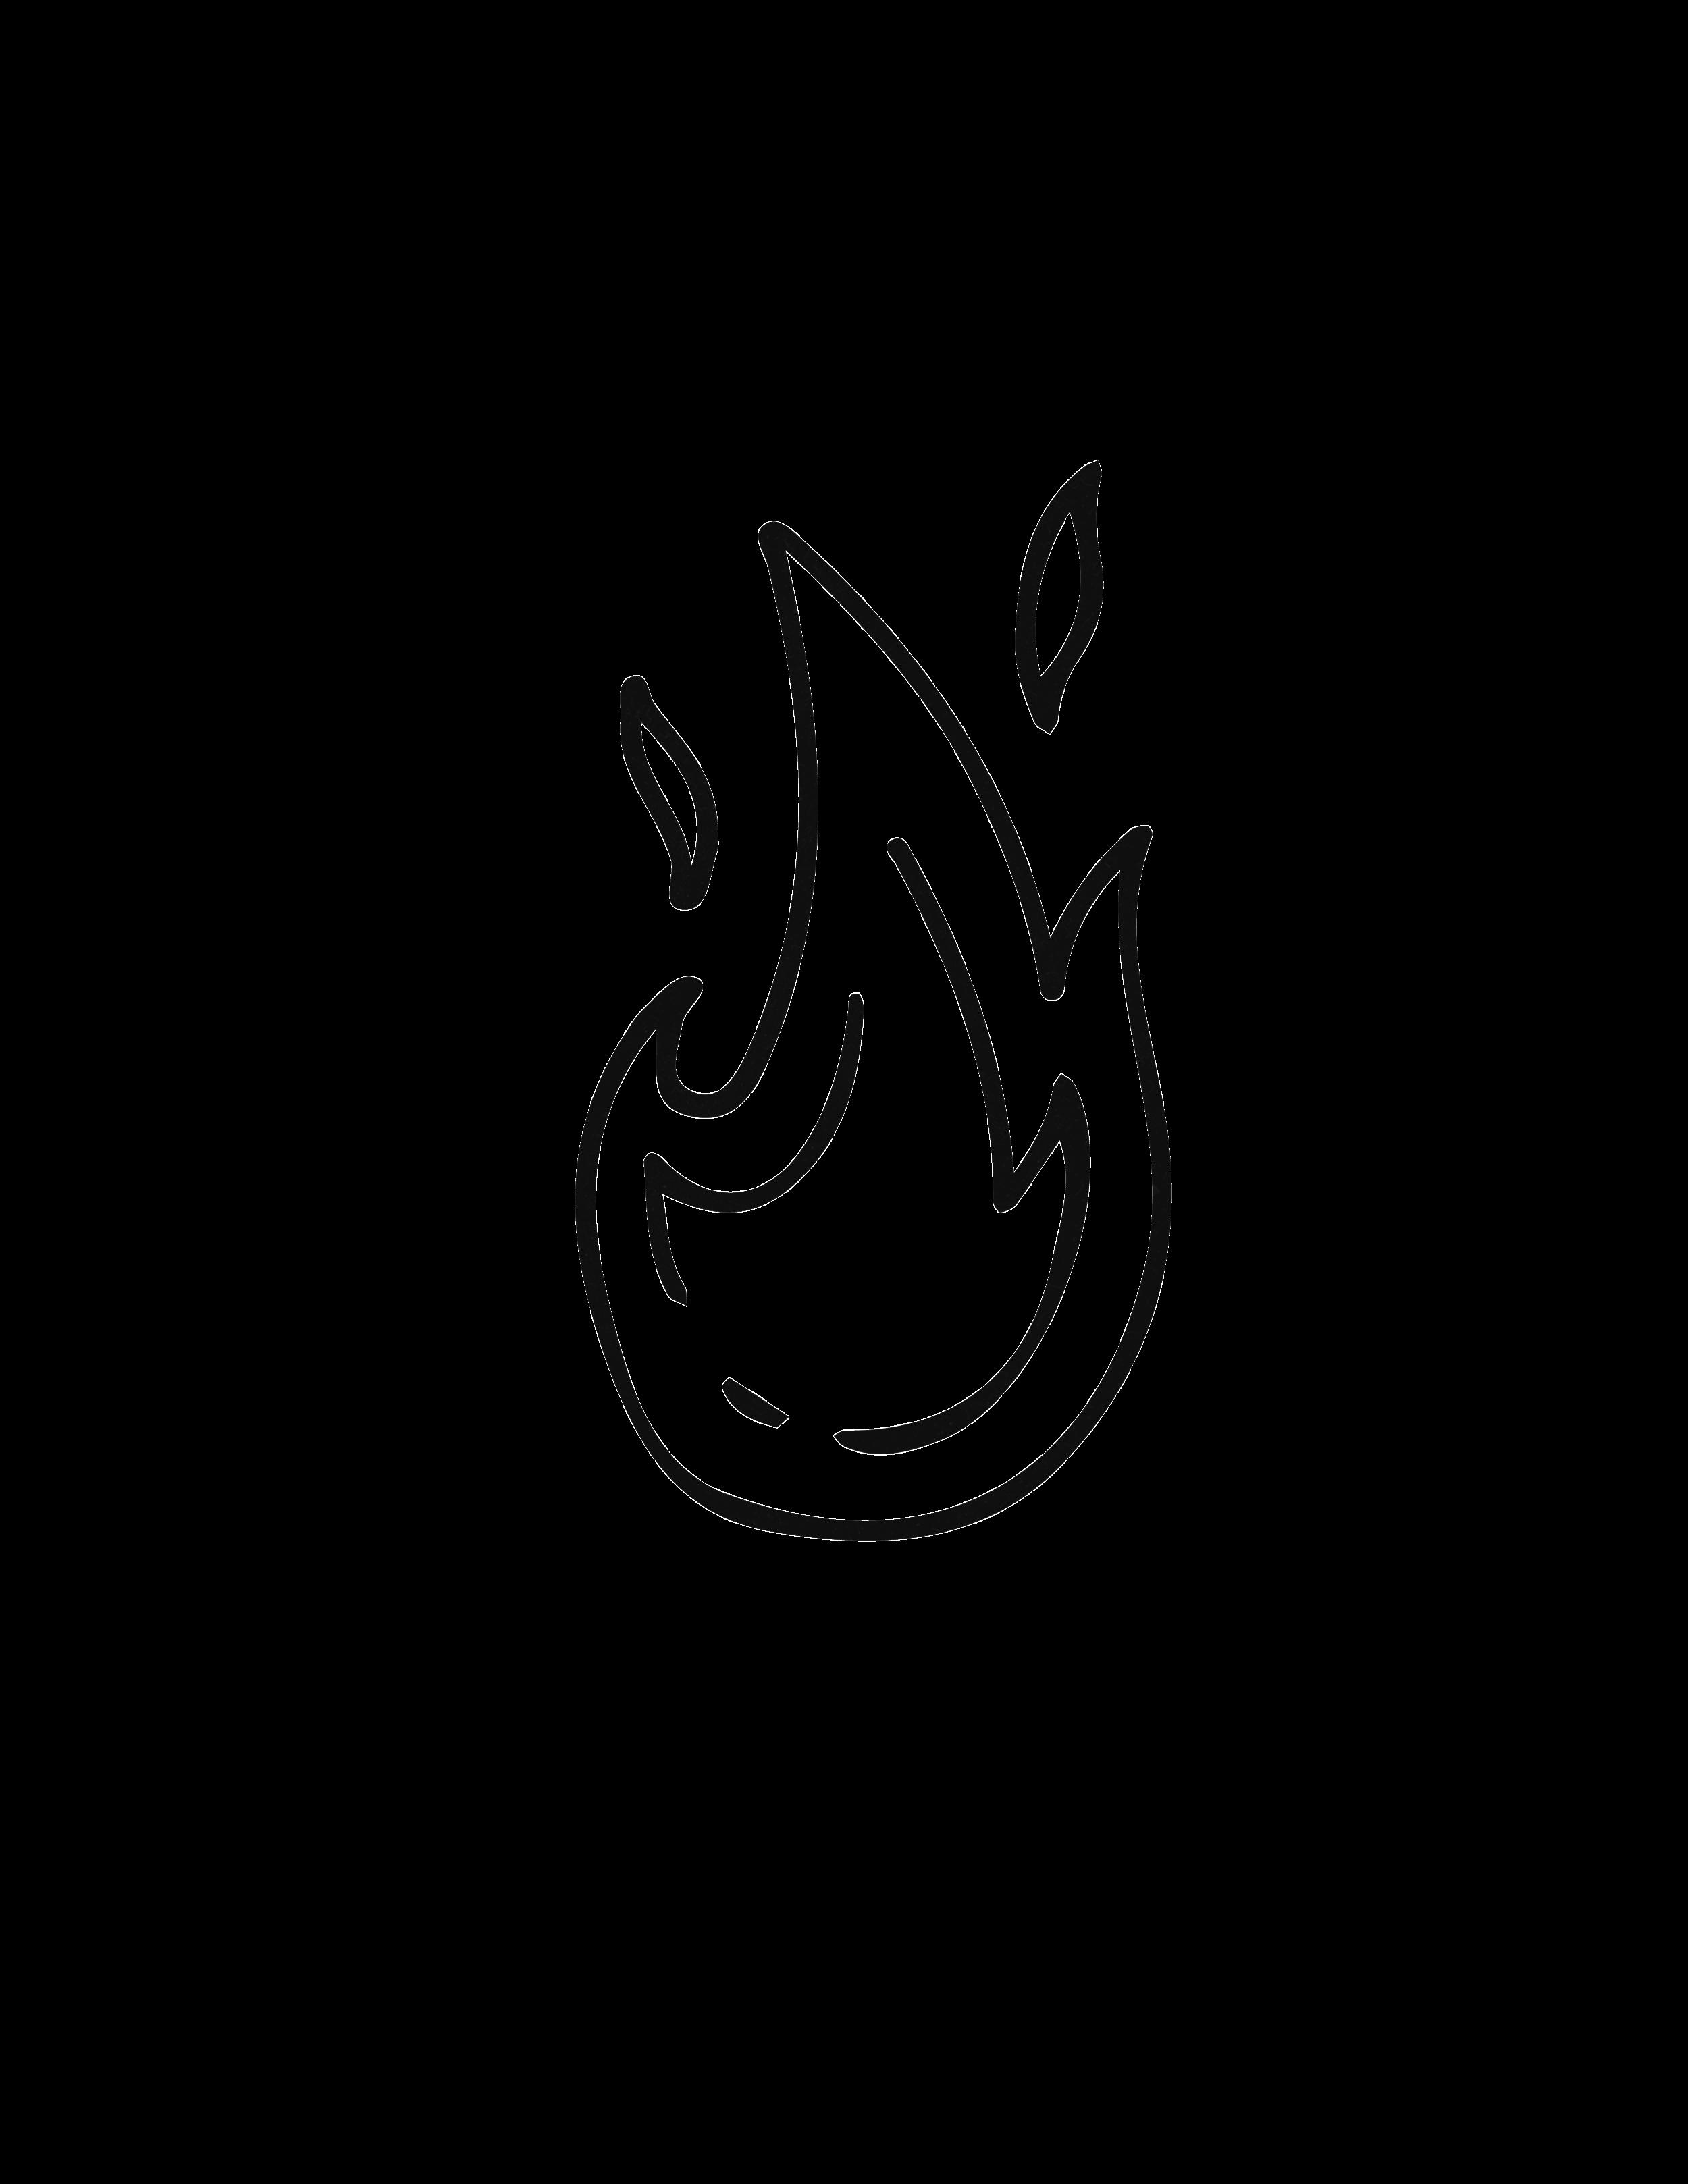 kaylee villeneuve - logo (branding)-23.png